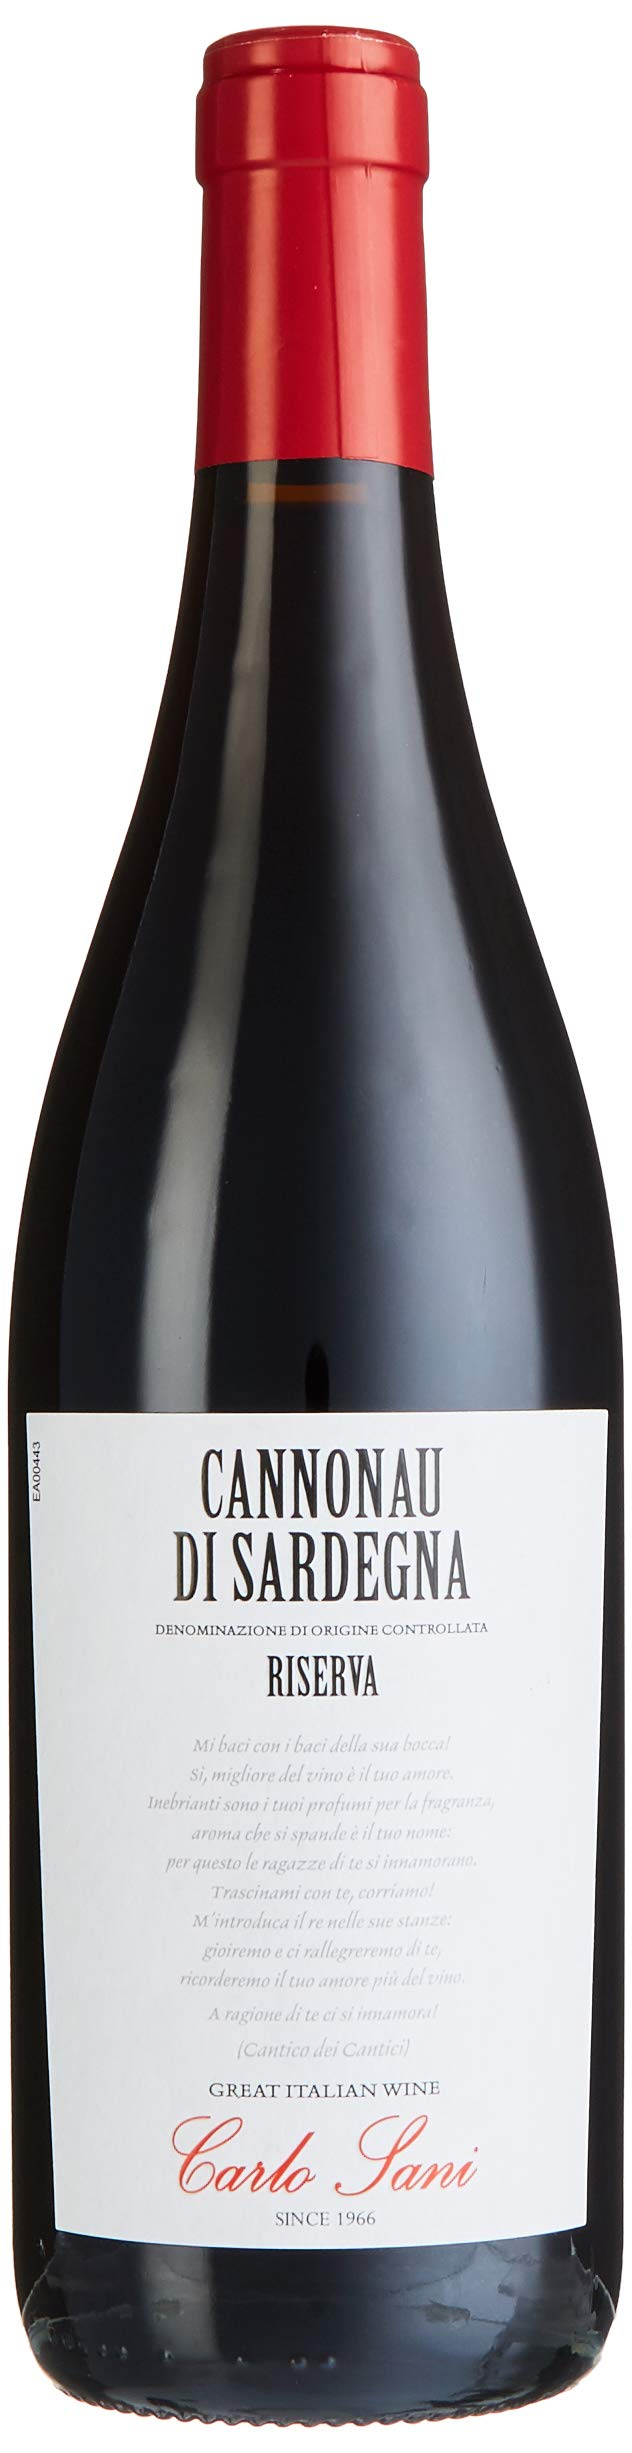 Carlo-Sani-Cannonau-di-Sardegna-Riserva-2013